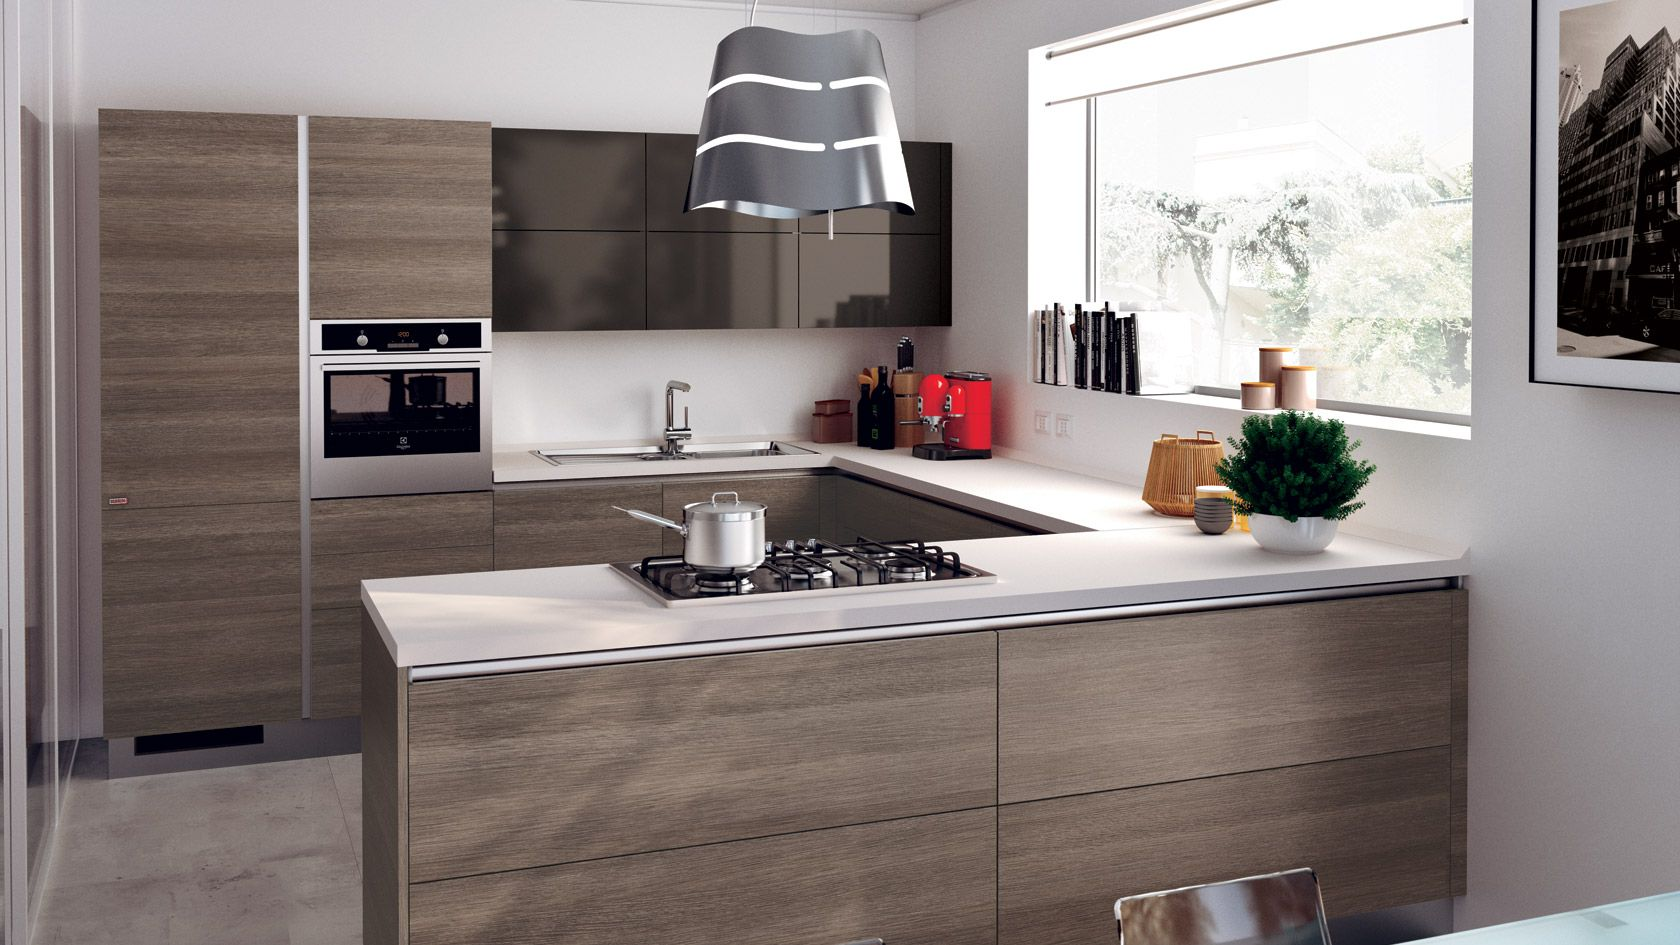 Cocina Evolution Scavolini | Arquitectura | Pinterest | Cocinas ...